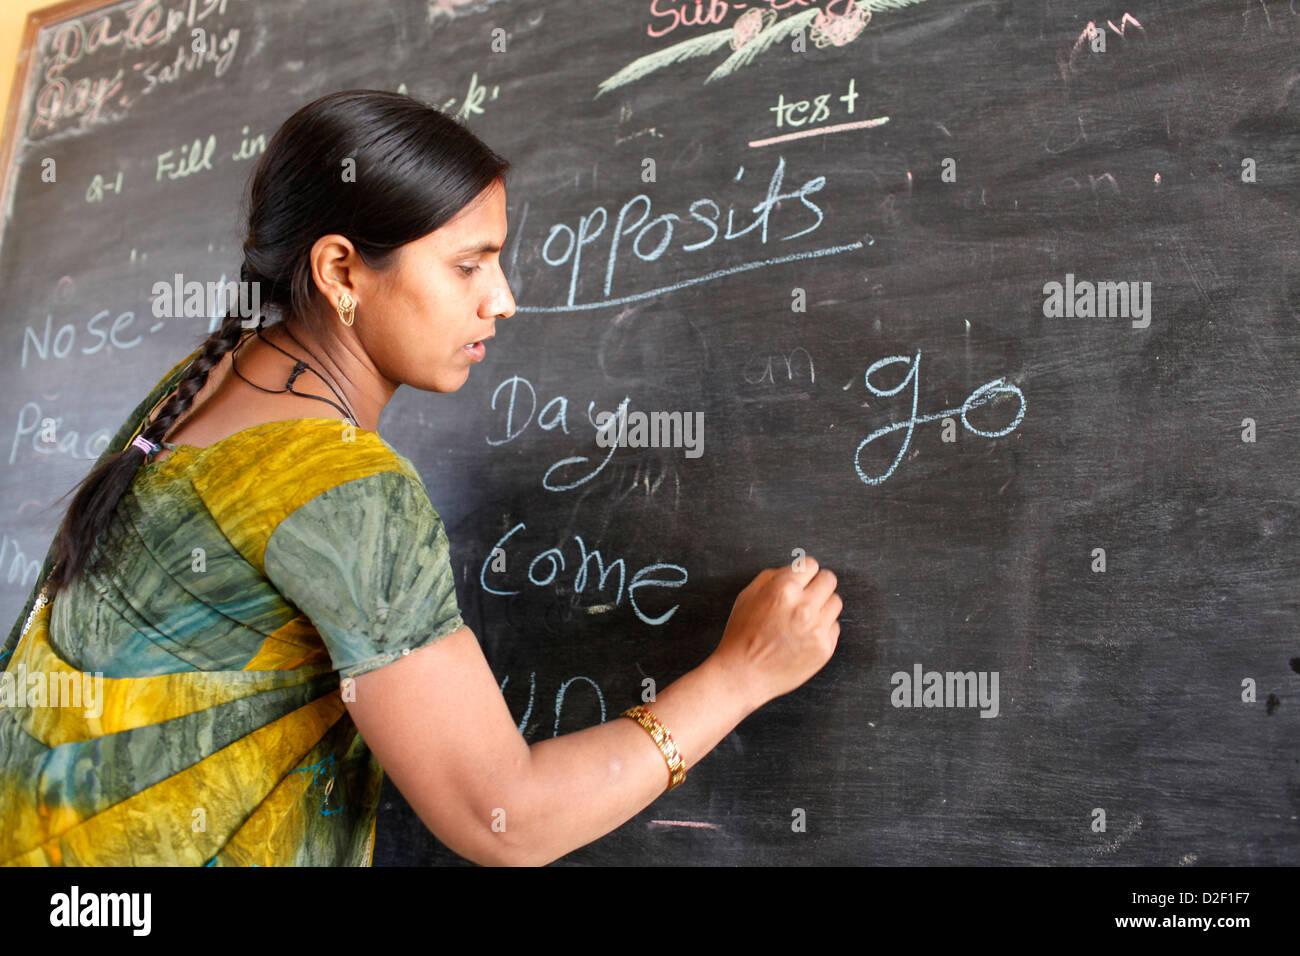 Sandipani Muni High School Lehrer Vrindavan. Indien. Stockbild